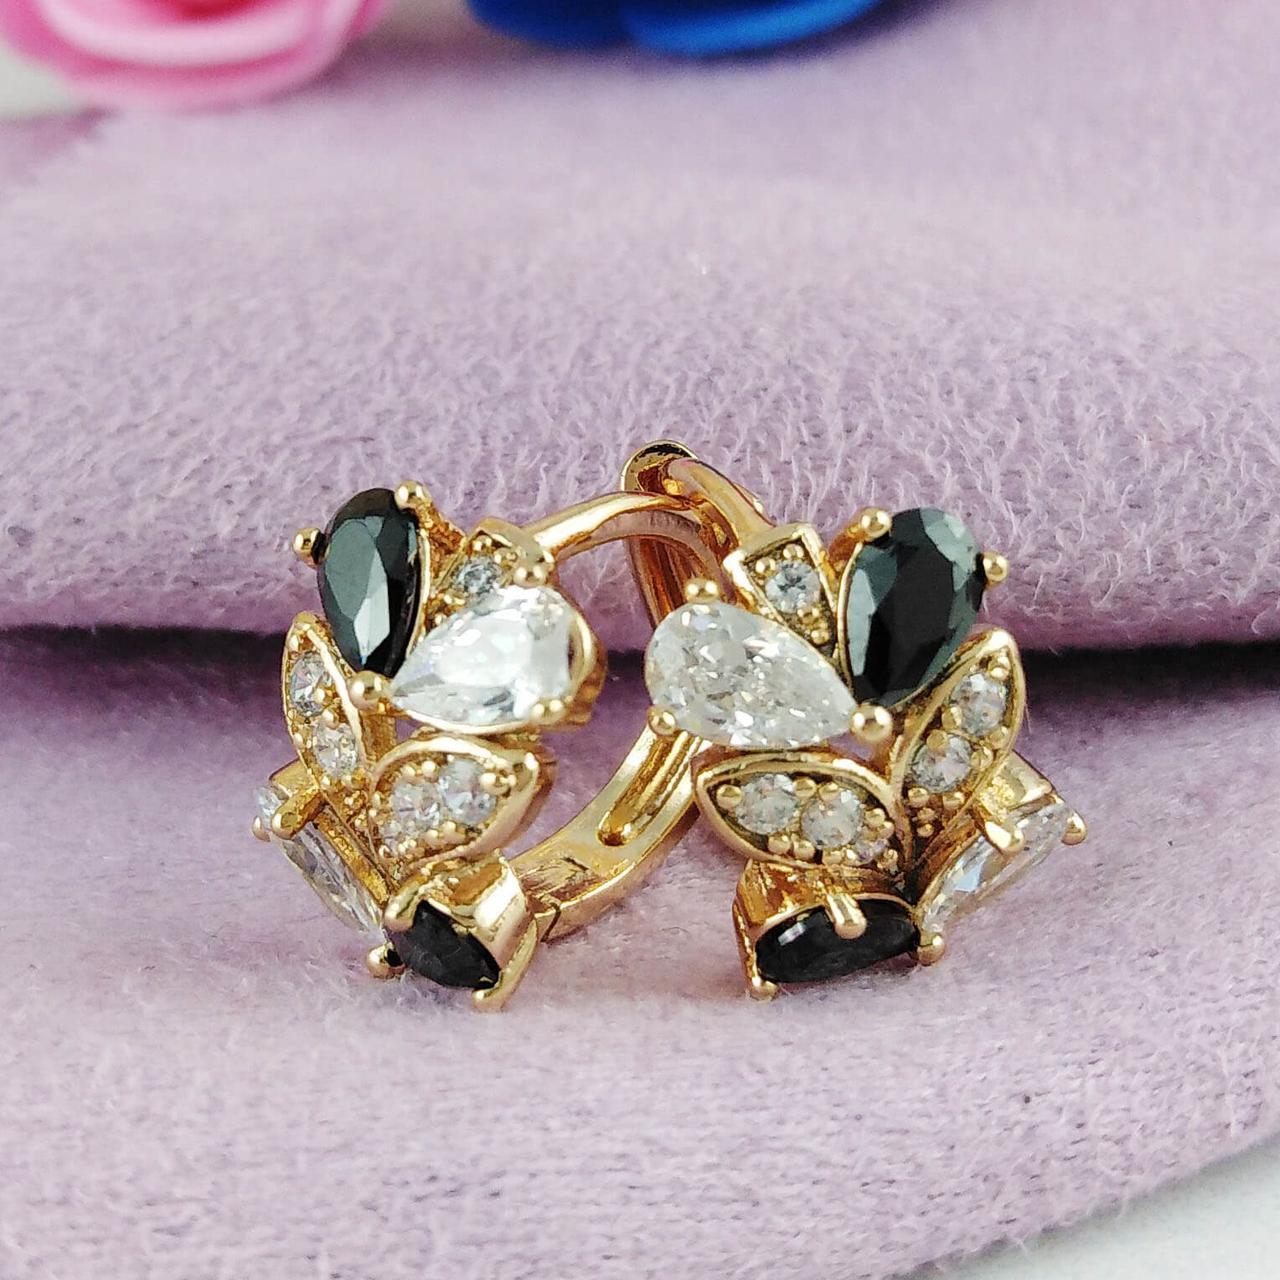 Серьги колечки маленькие Xuping Jewelry Лили черно-белые камни медицинское золото позолота 18К А/В 5805